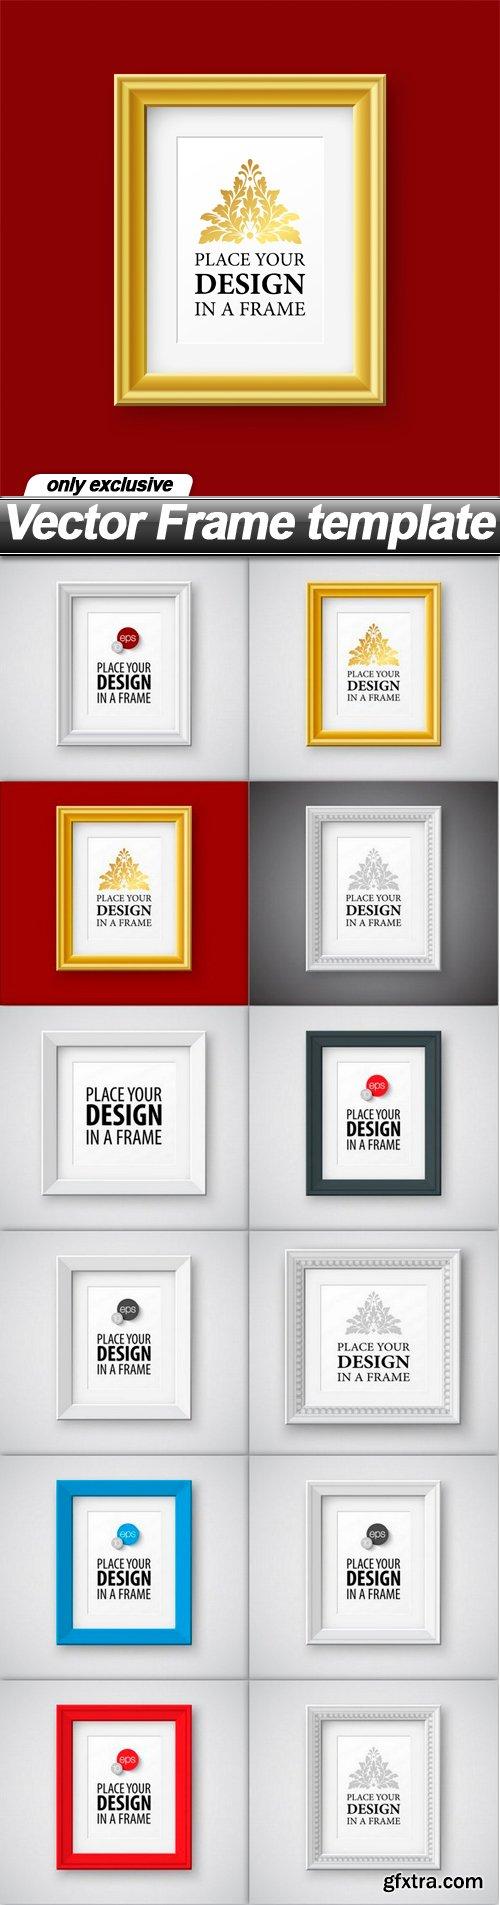 Vector Frame template - 12 EPS